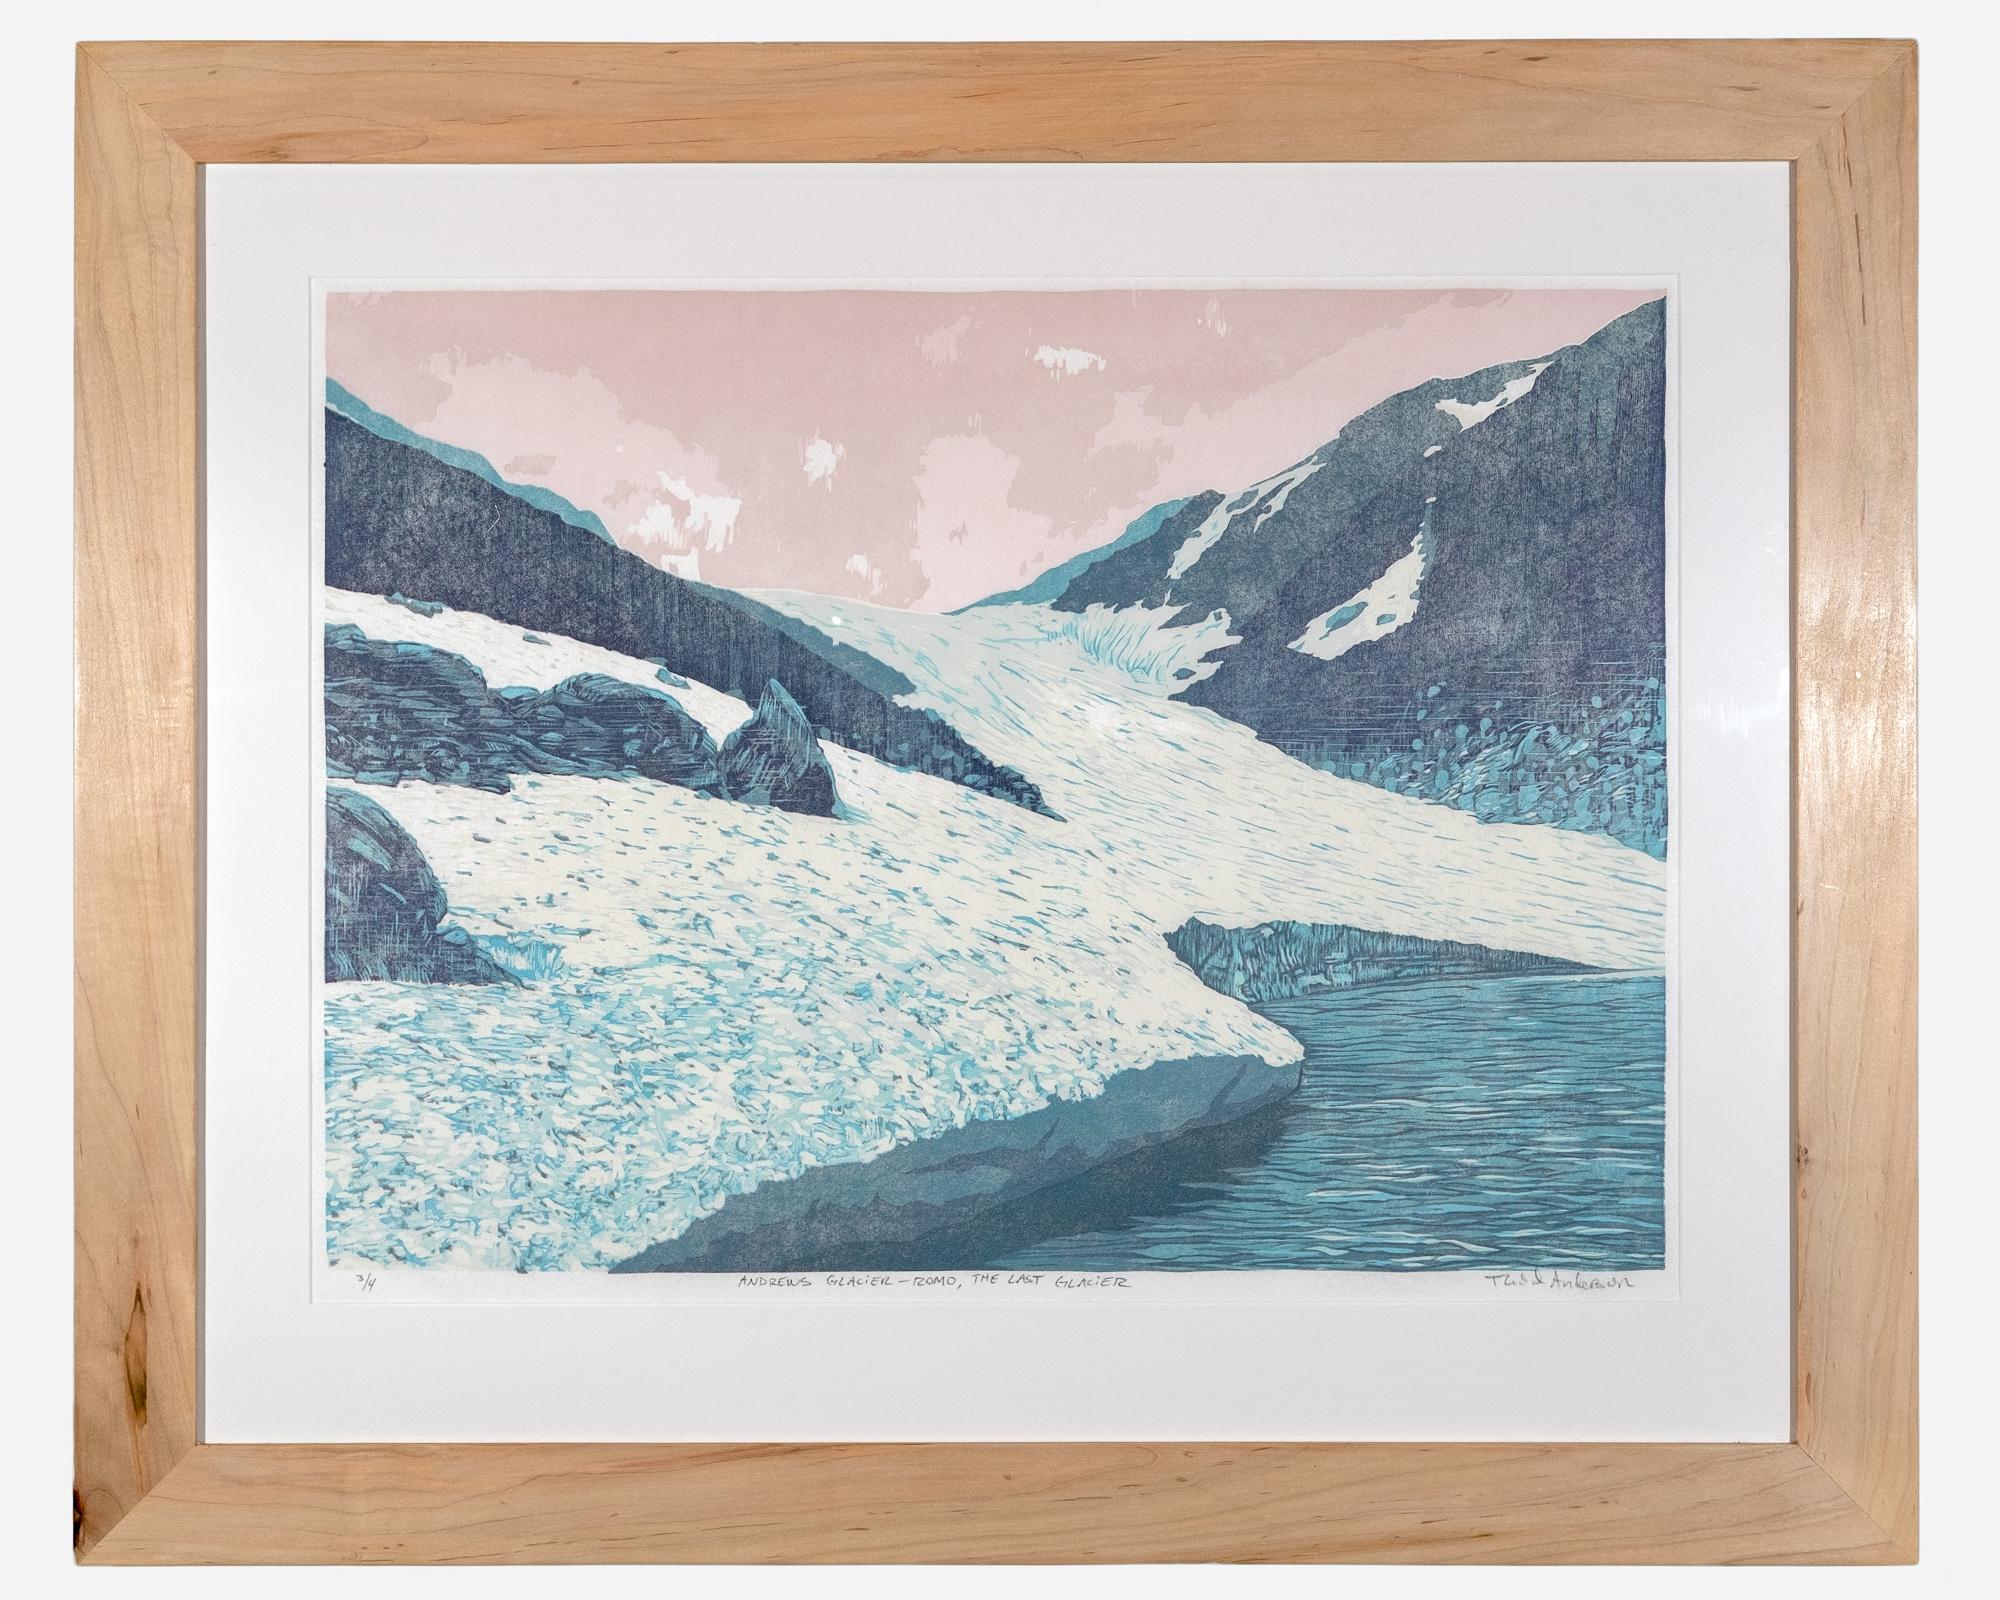 Andrews Glacier    Framed woodcut print on Okawara Washi paper   32 x 27 inches TAN 033G